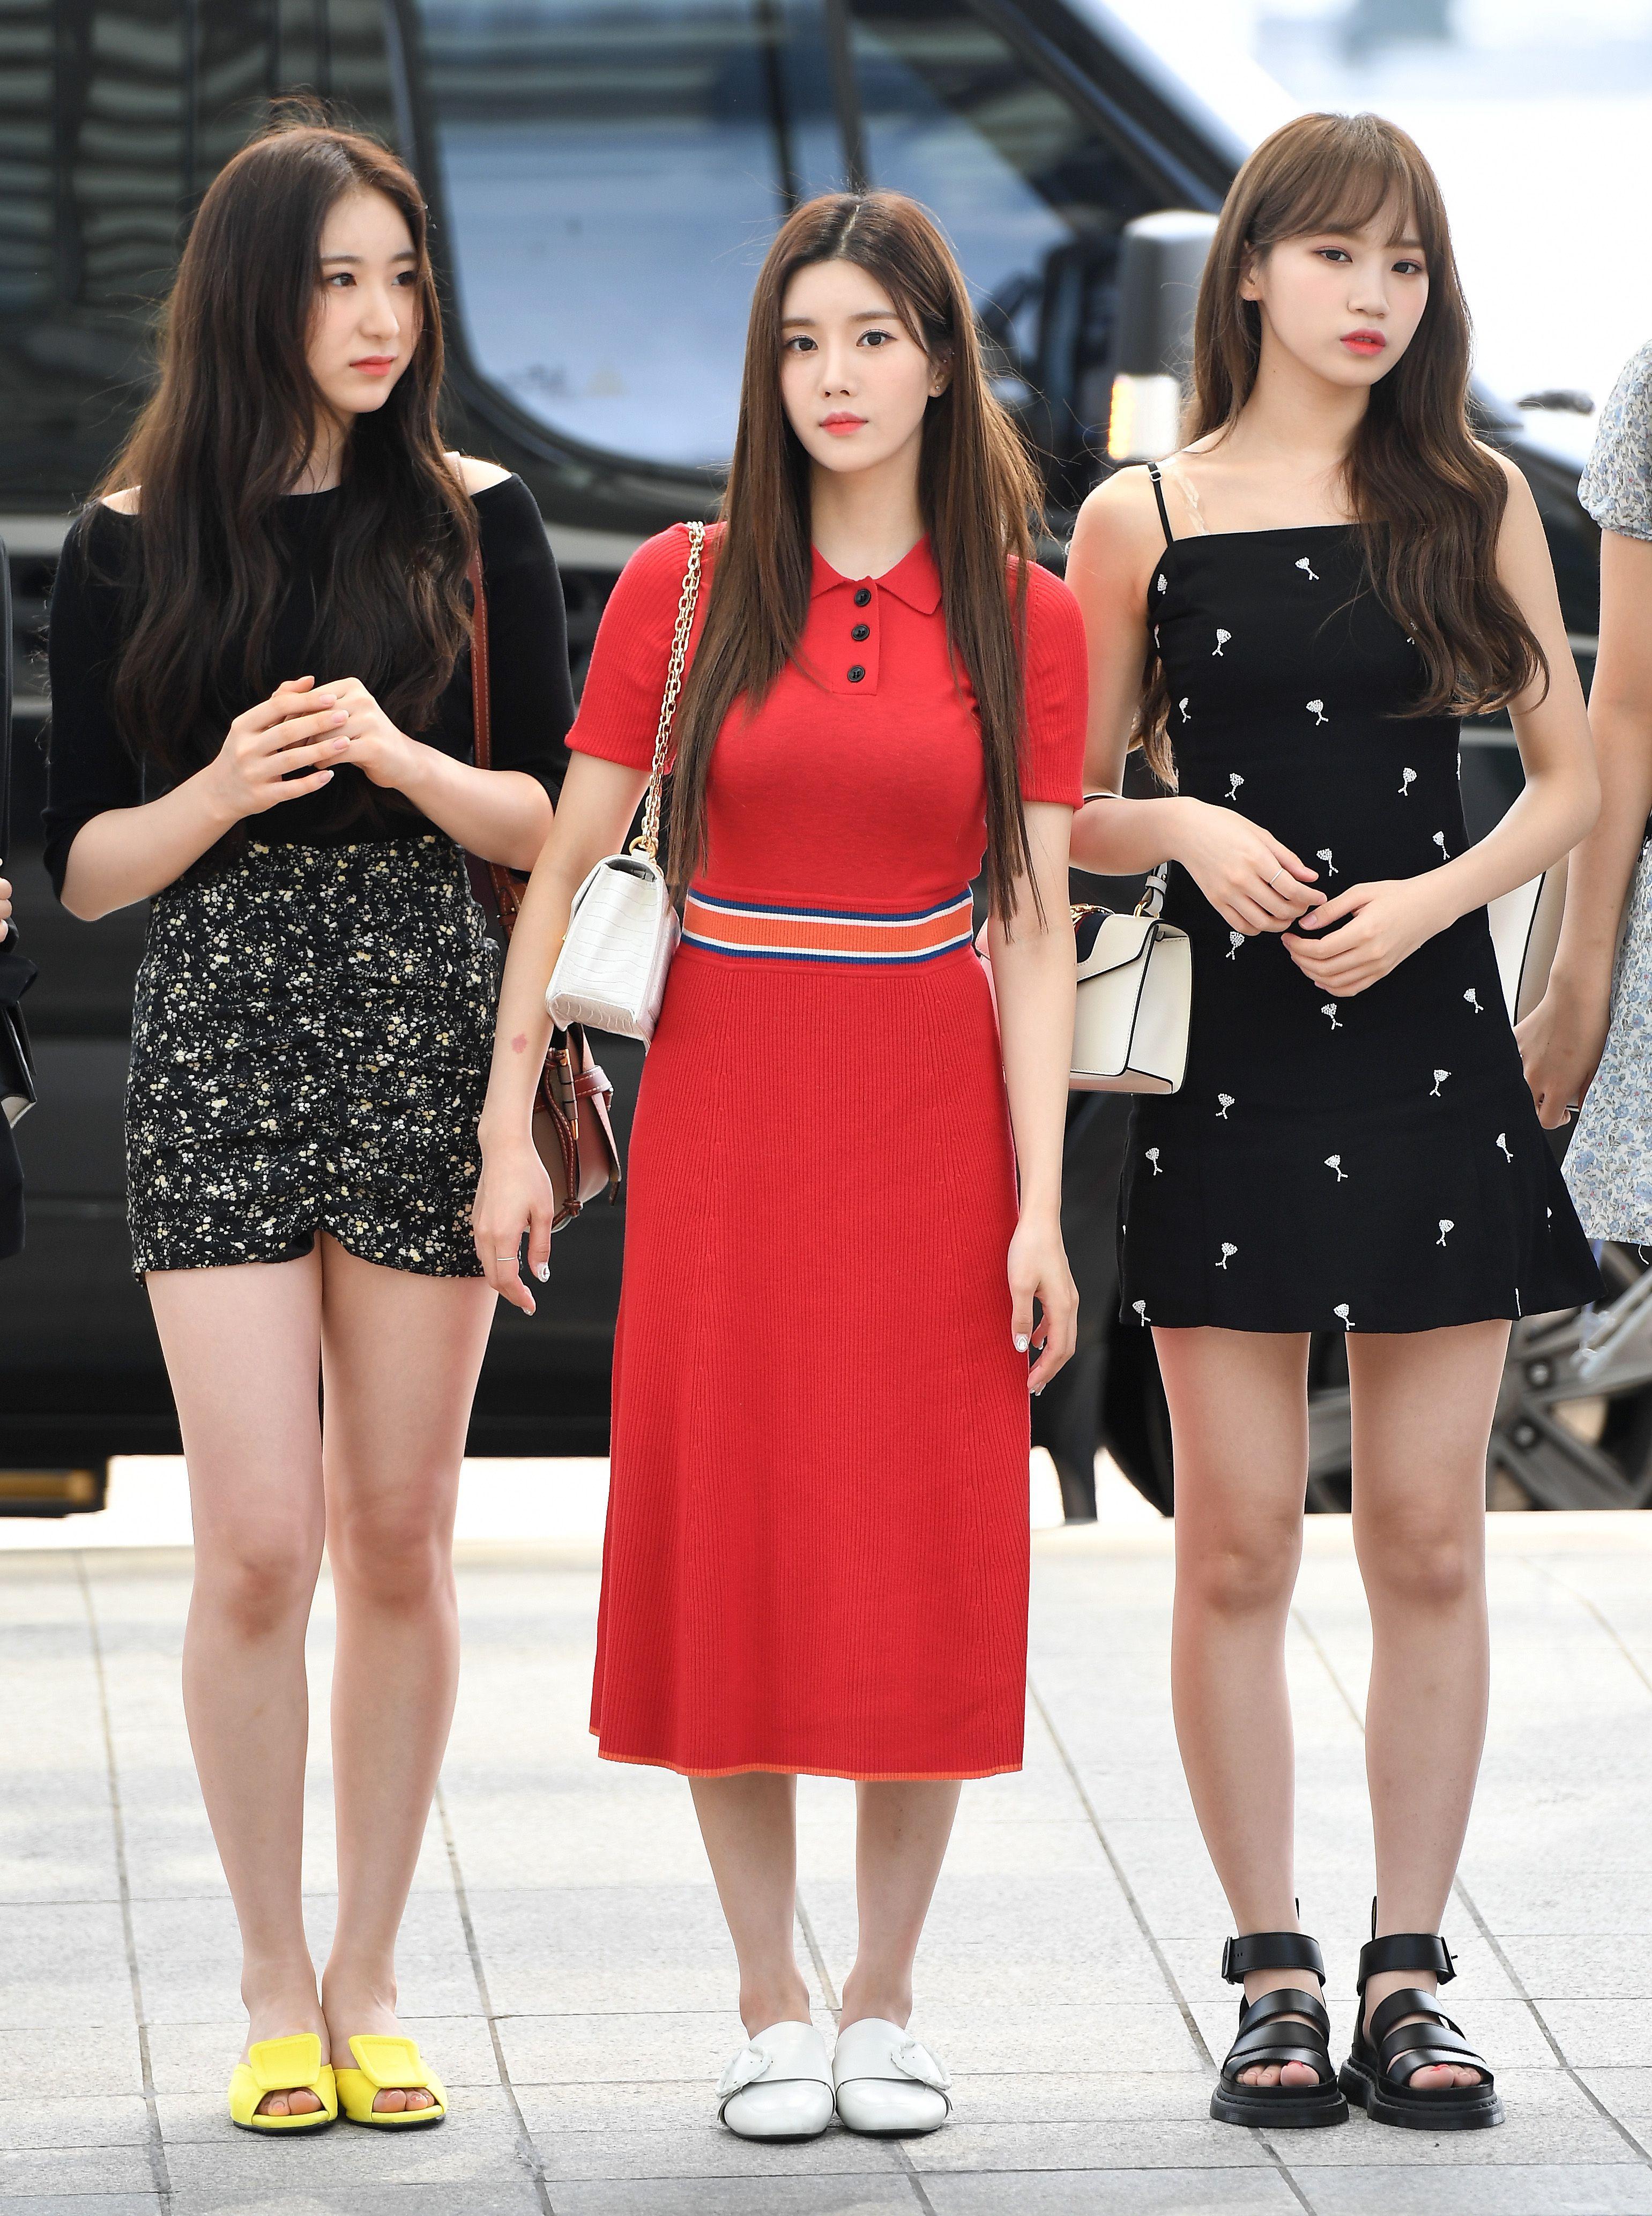 Izone Chaeyeon Chaewon Feet R Kpopfeets Kpopfeets Kpop Kpop Fashion Fashion Fashion Idol